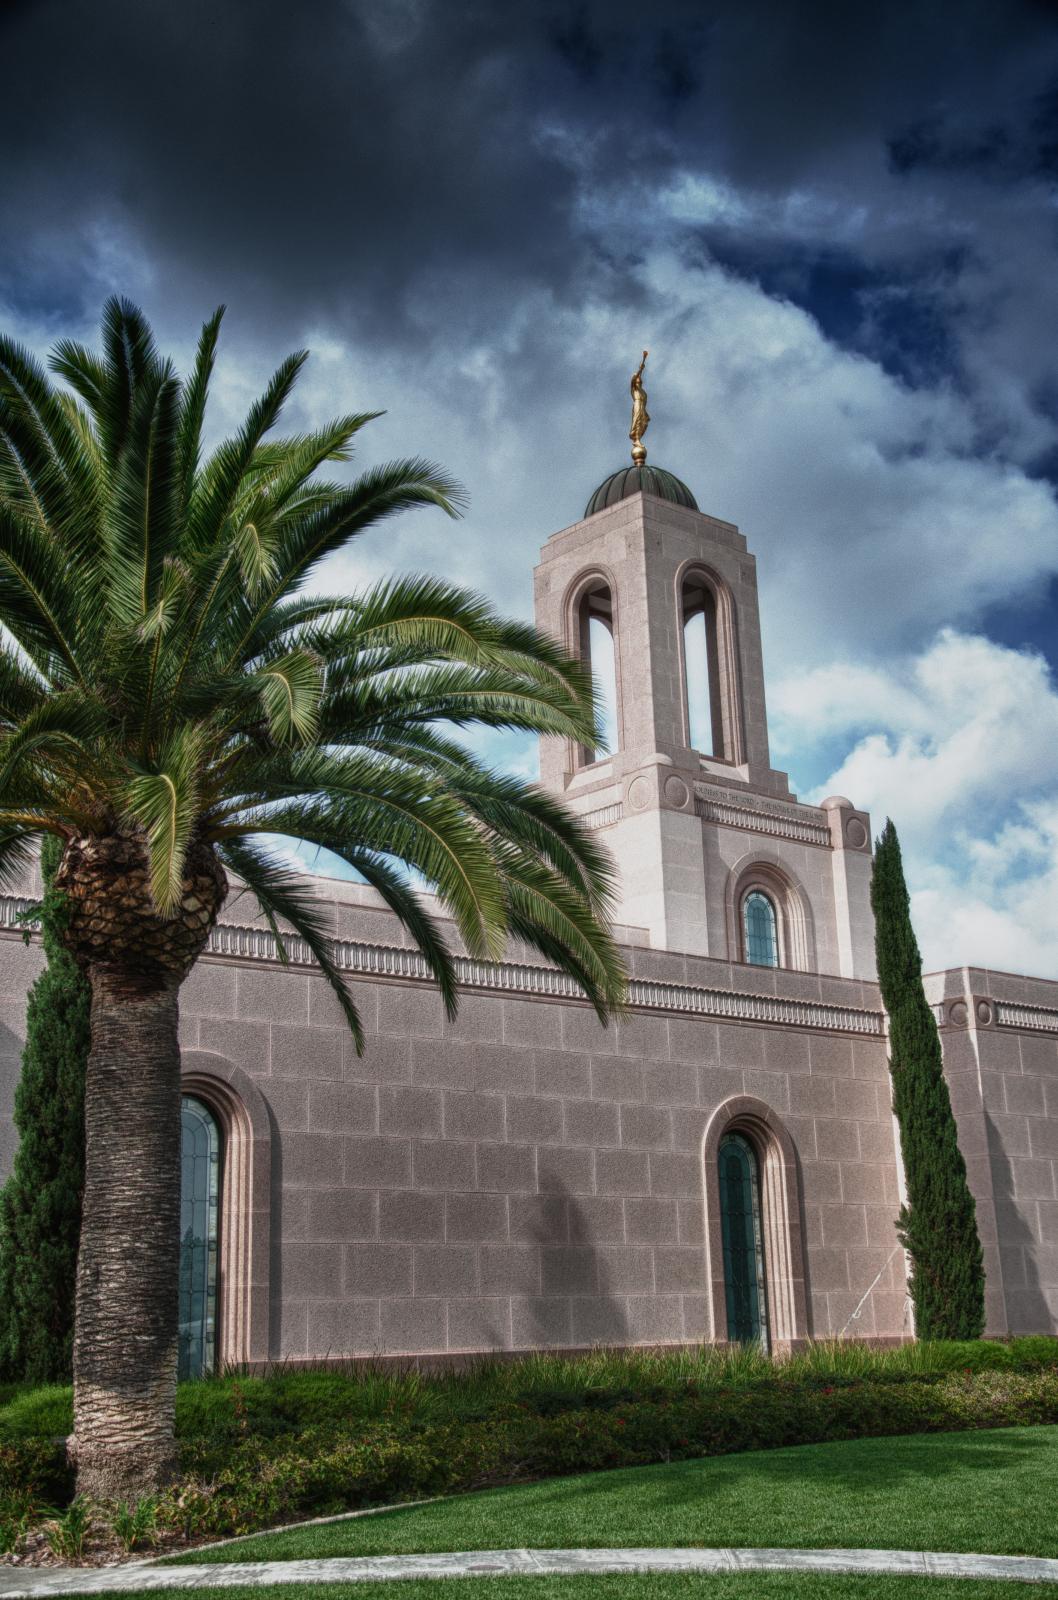 Newport Beach California Temple In A Storm